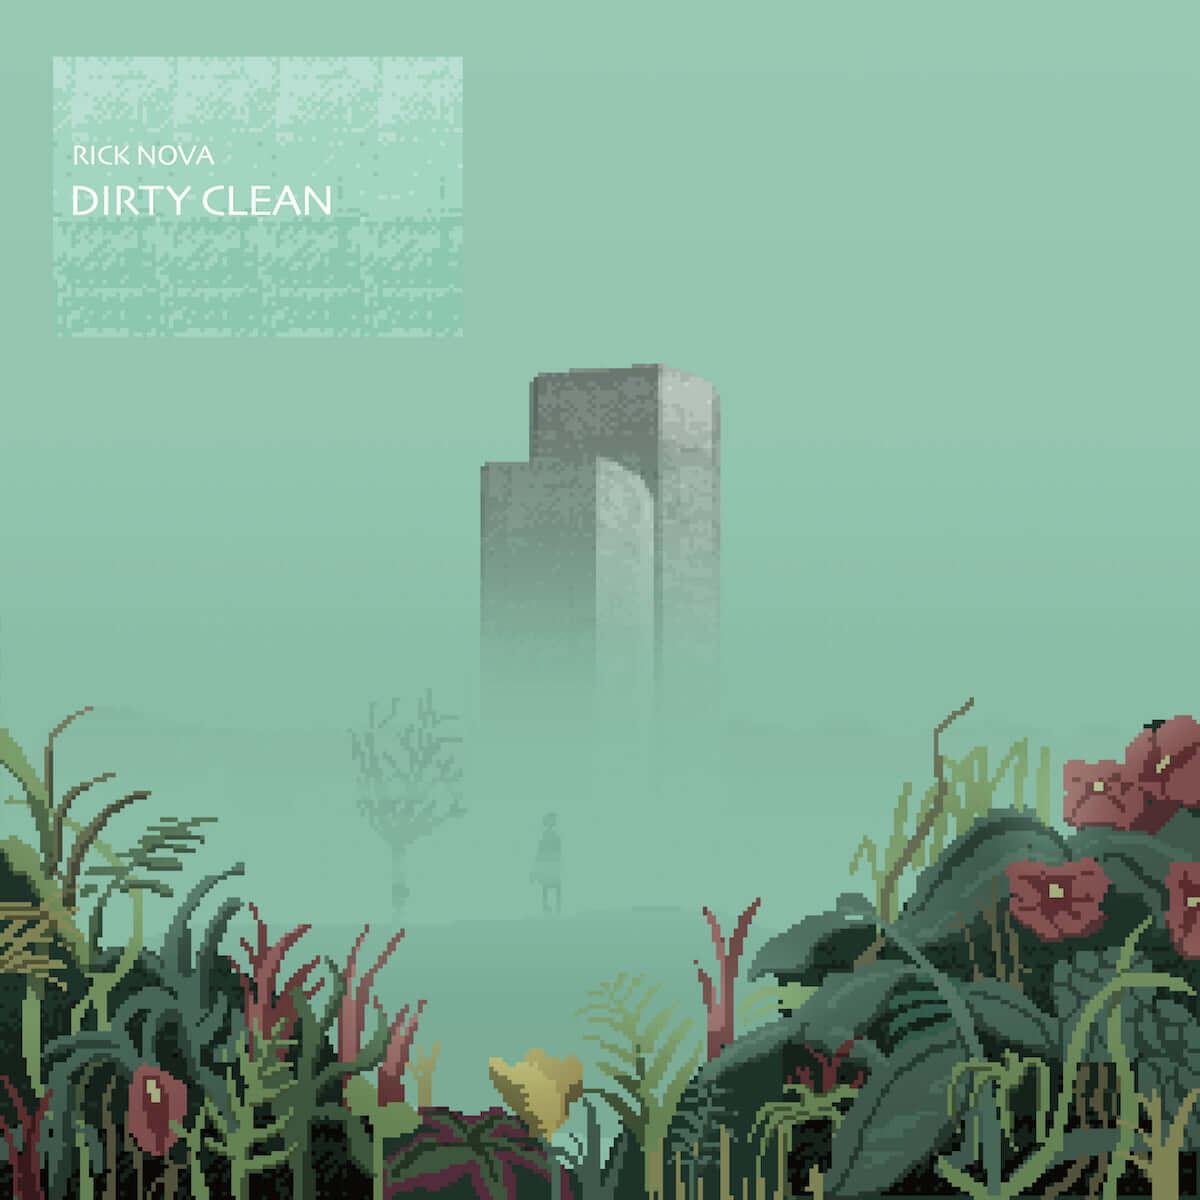 RICK NOVAによる新作EP『DIRTY CLEAN』が本日リリース music190130-rick-nova-1-1200x1200